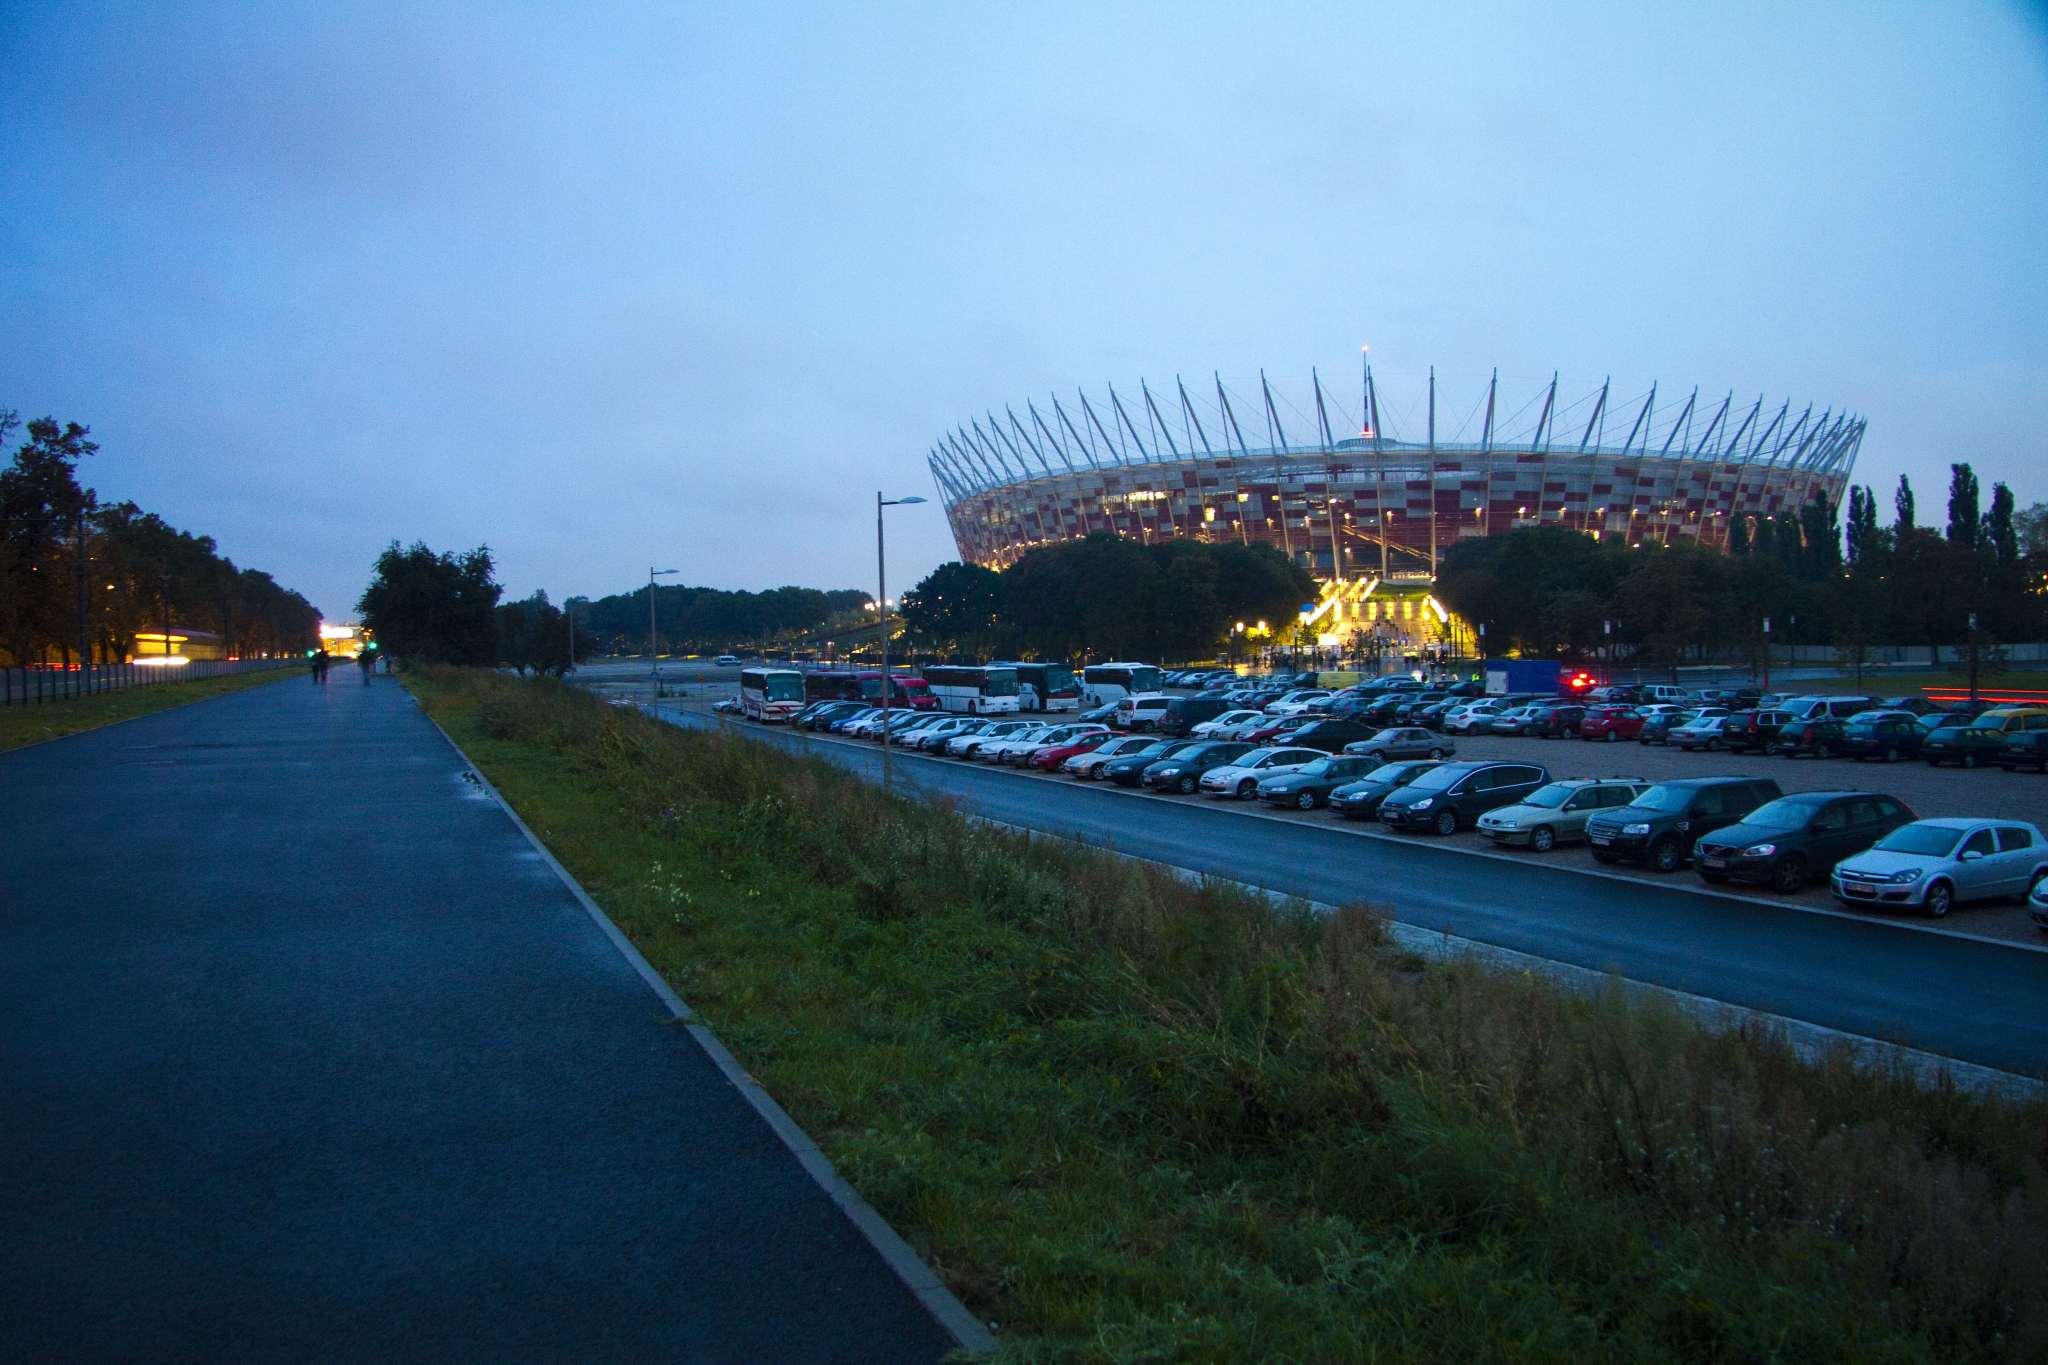 Narodowy Stadium 3